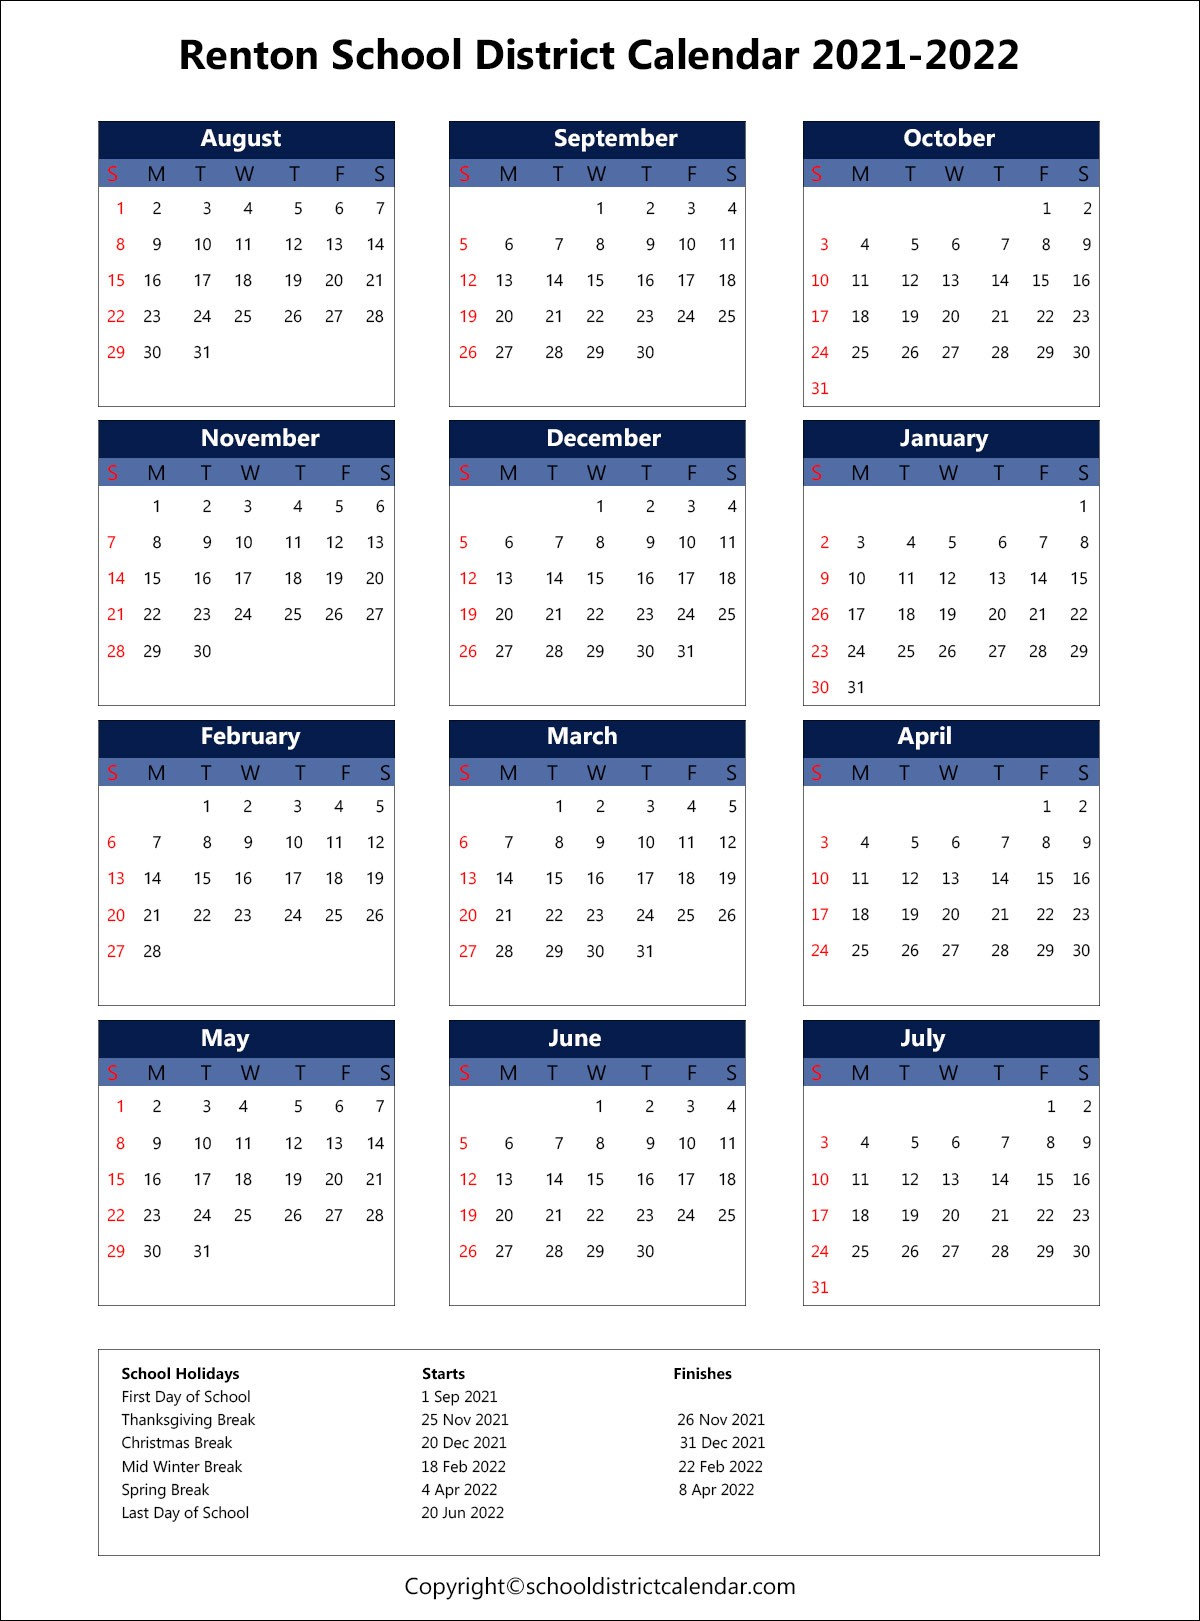 Renton School District Calendar Holidays 2021-2022 regarding Fresno Unified School Calendar 2022